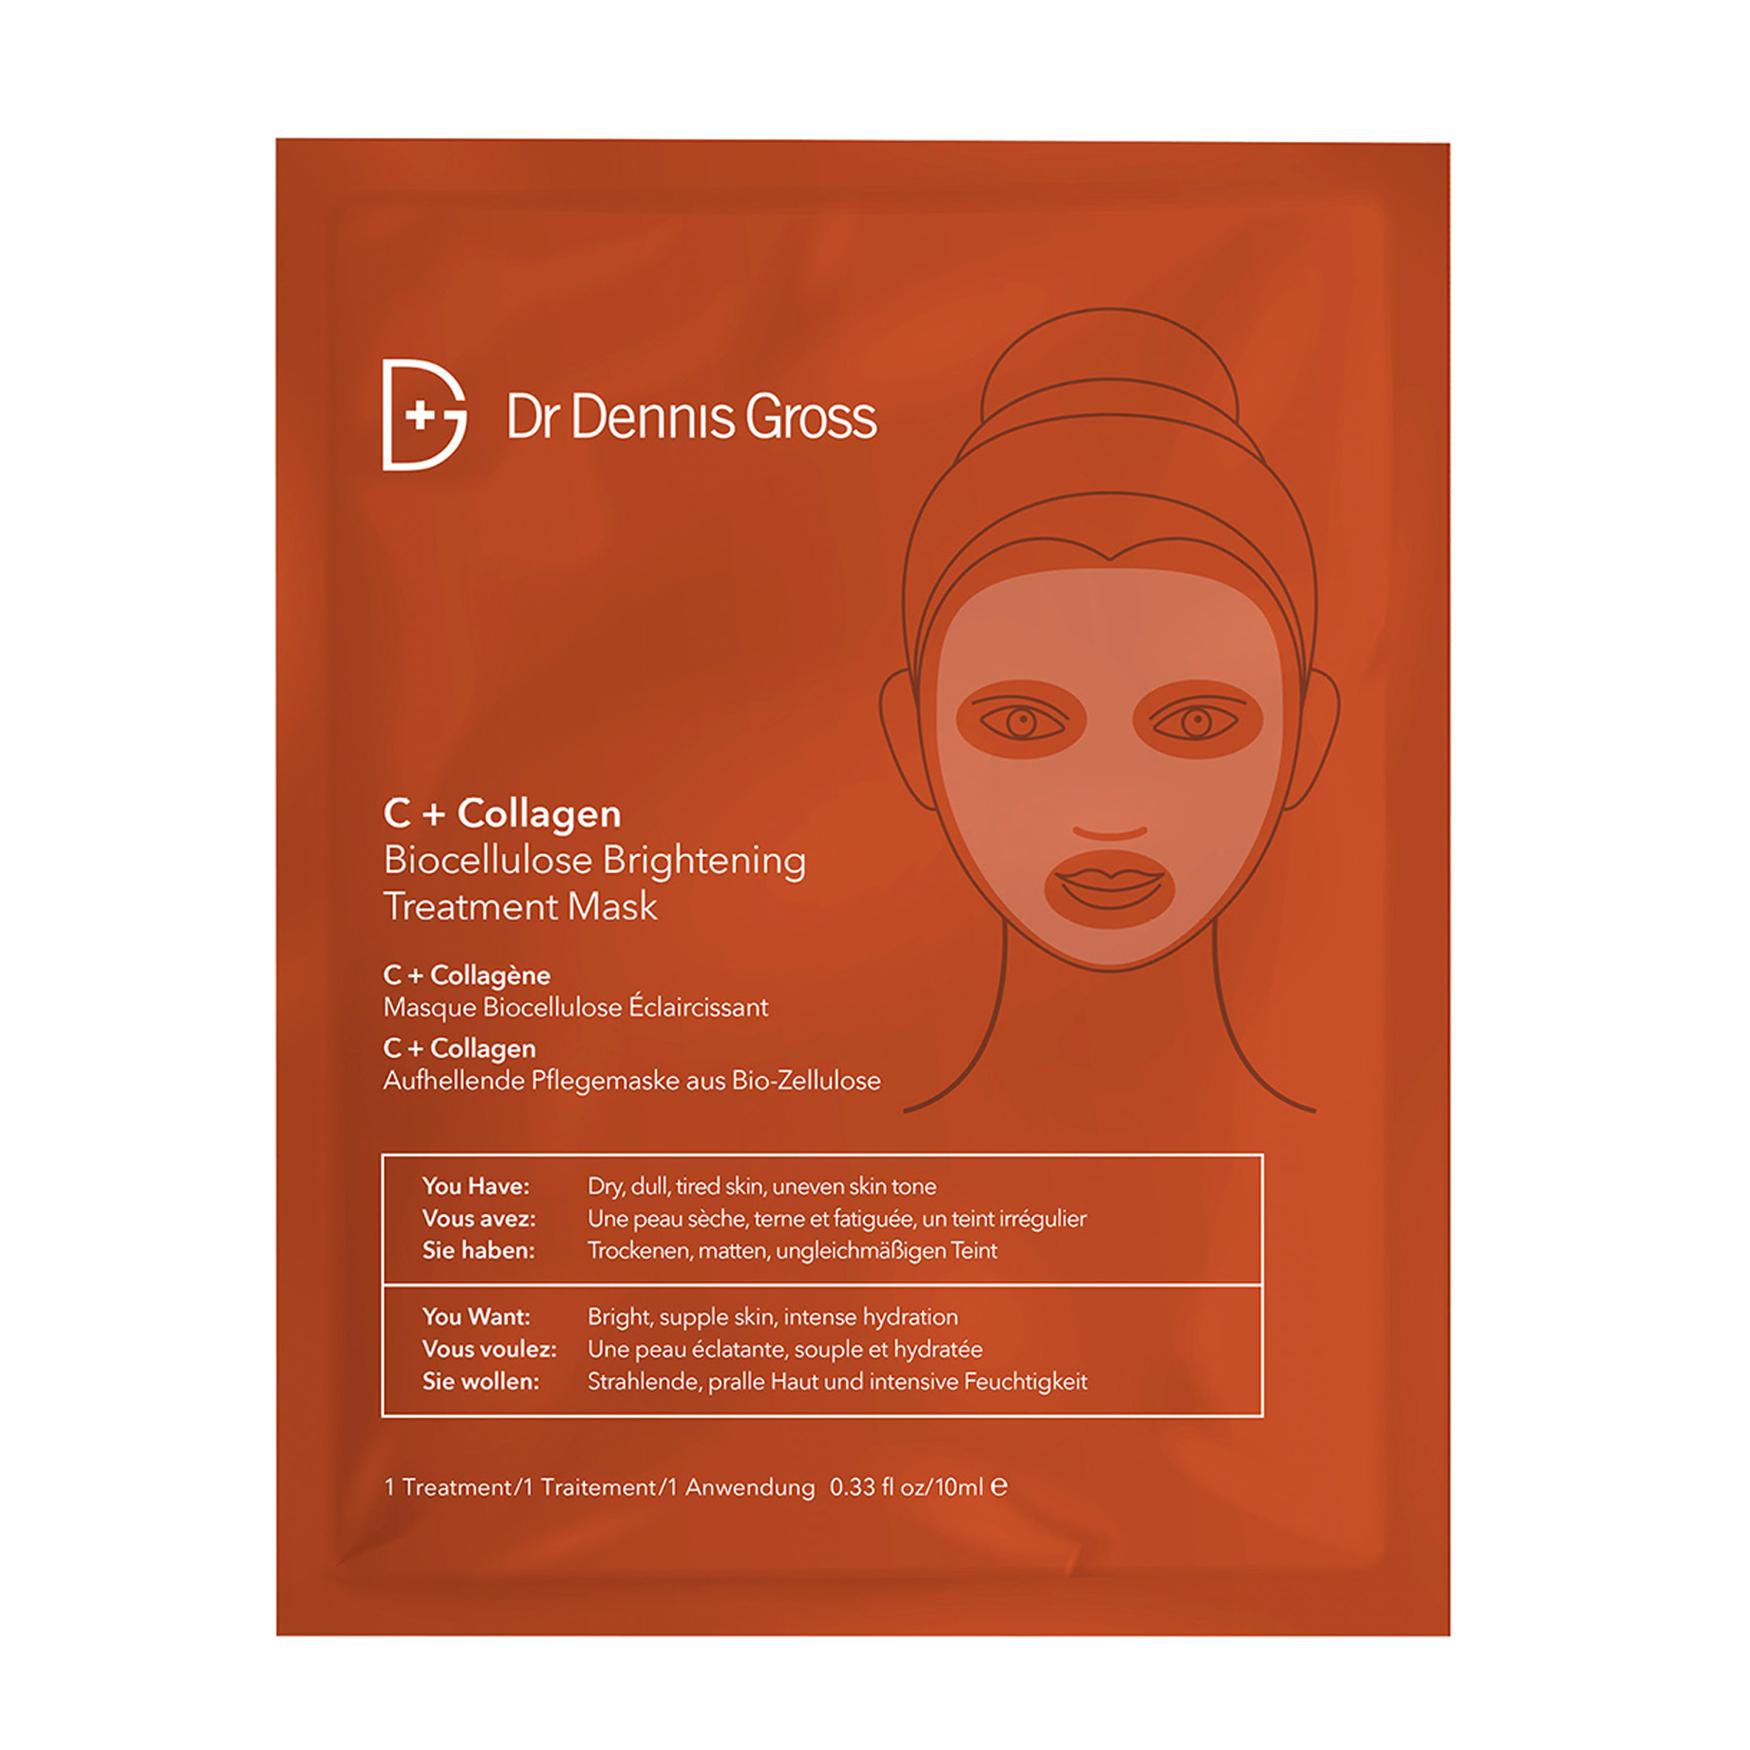 Dr. Dennis Gross C+Collagen Biocellulose Brightening Treatment Mask